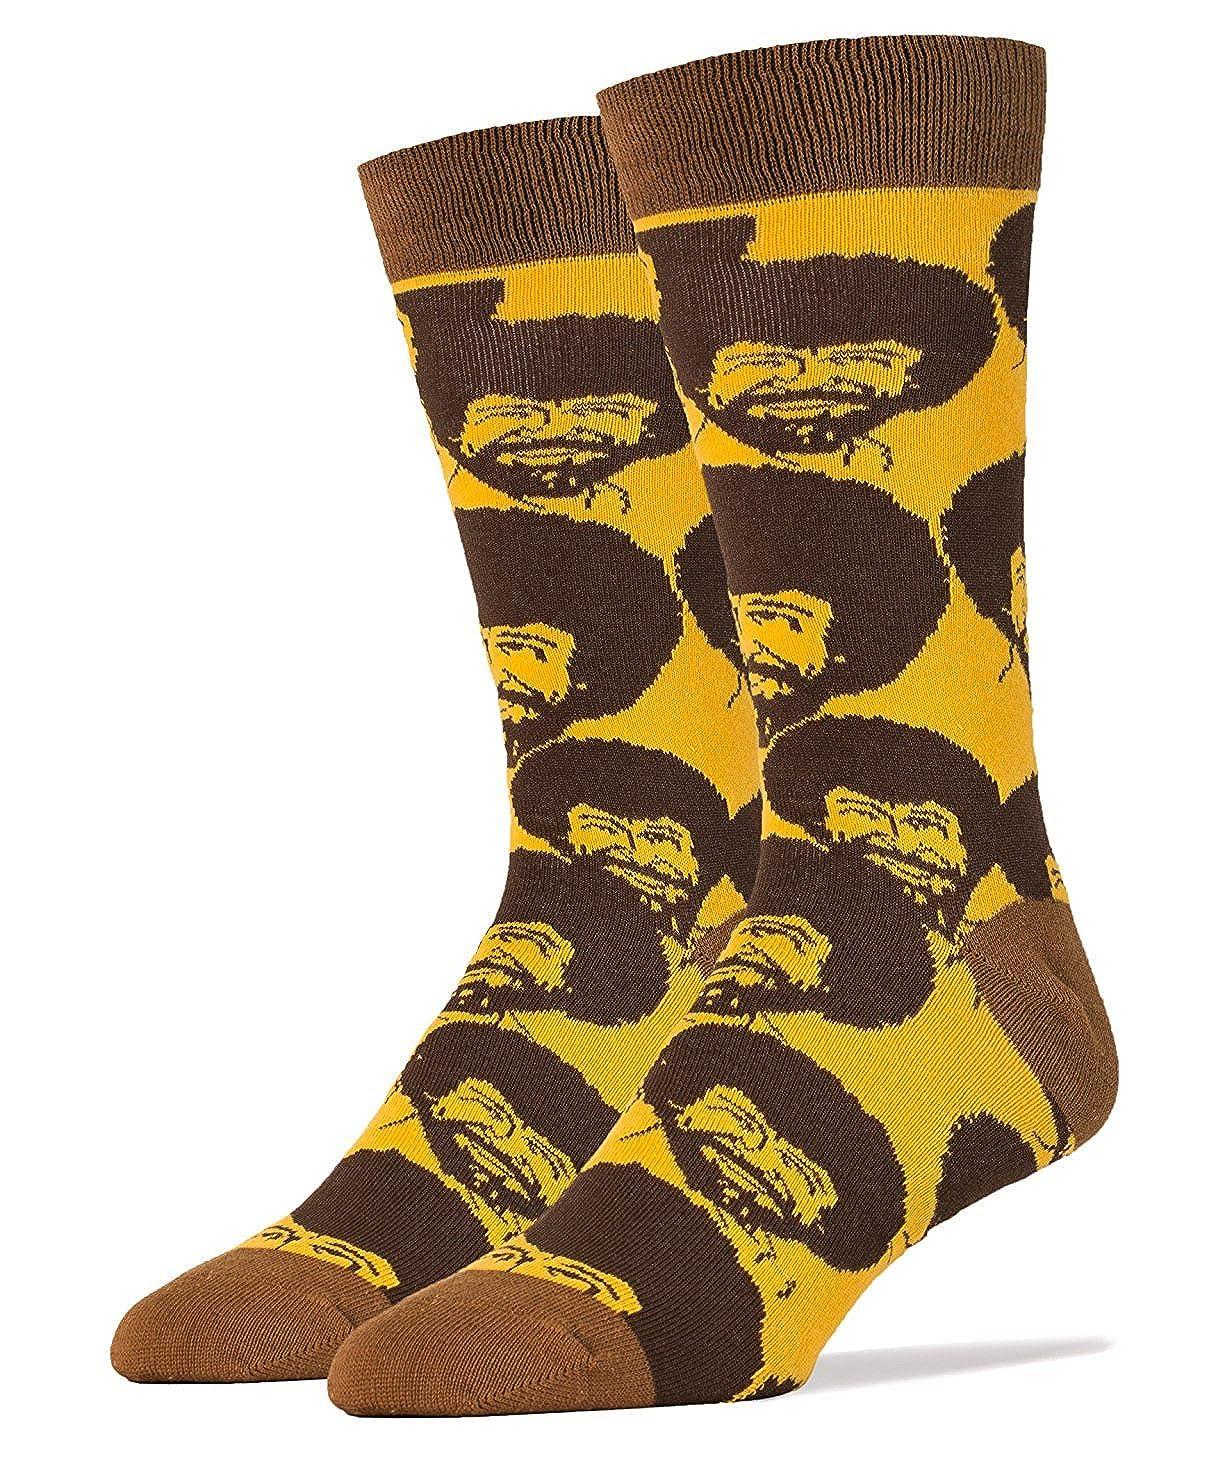 Bob Ross Flash Mob Men's Crew Socks JY Instyle MD5024C